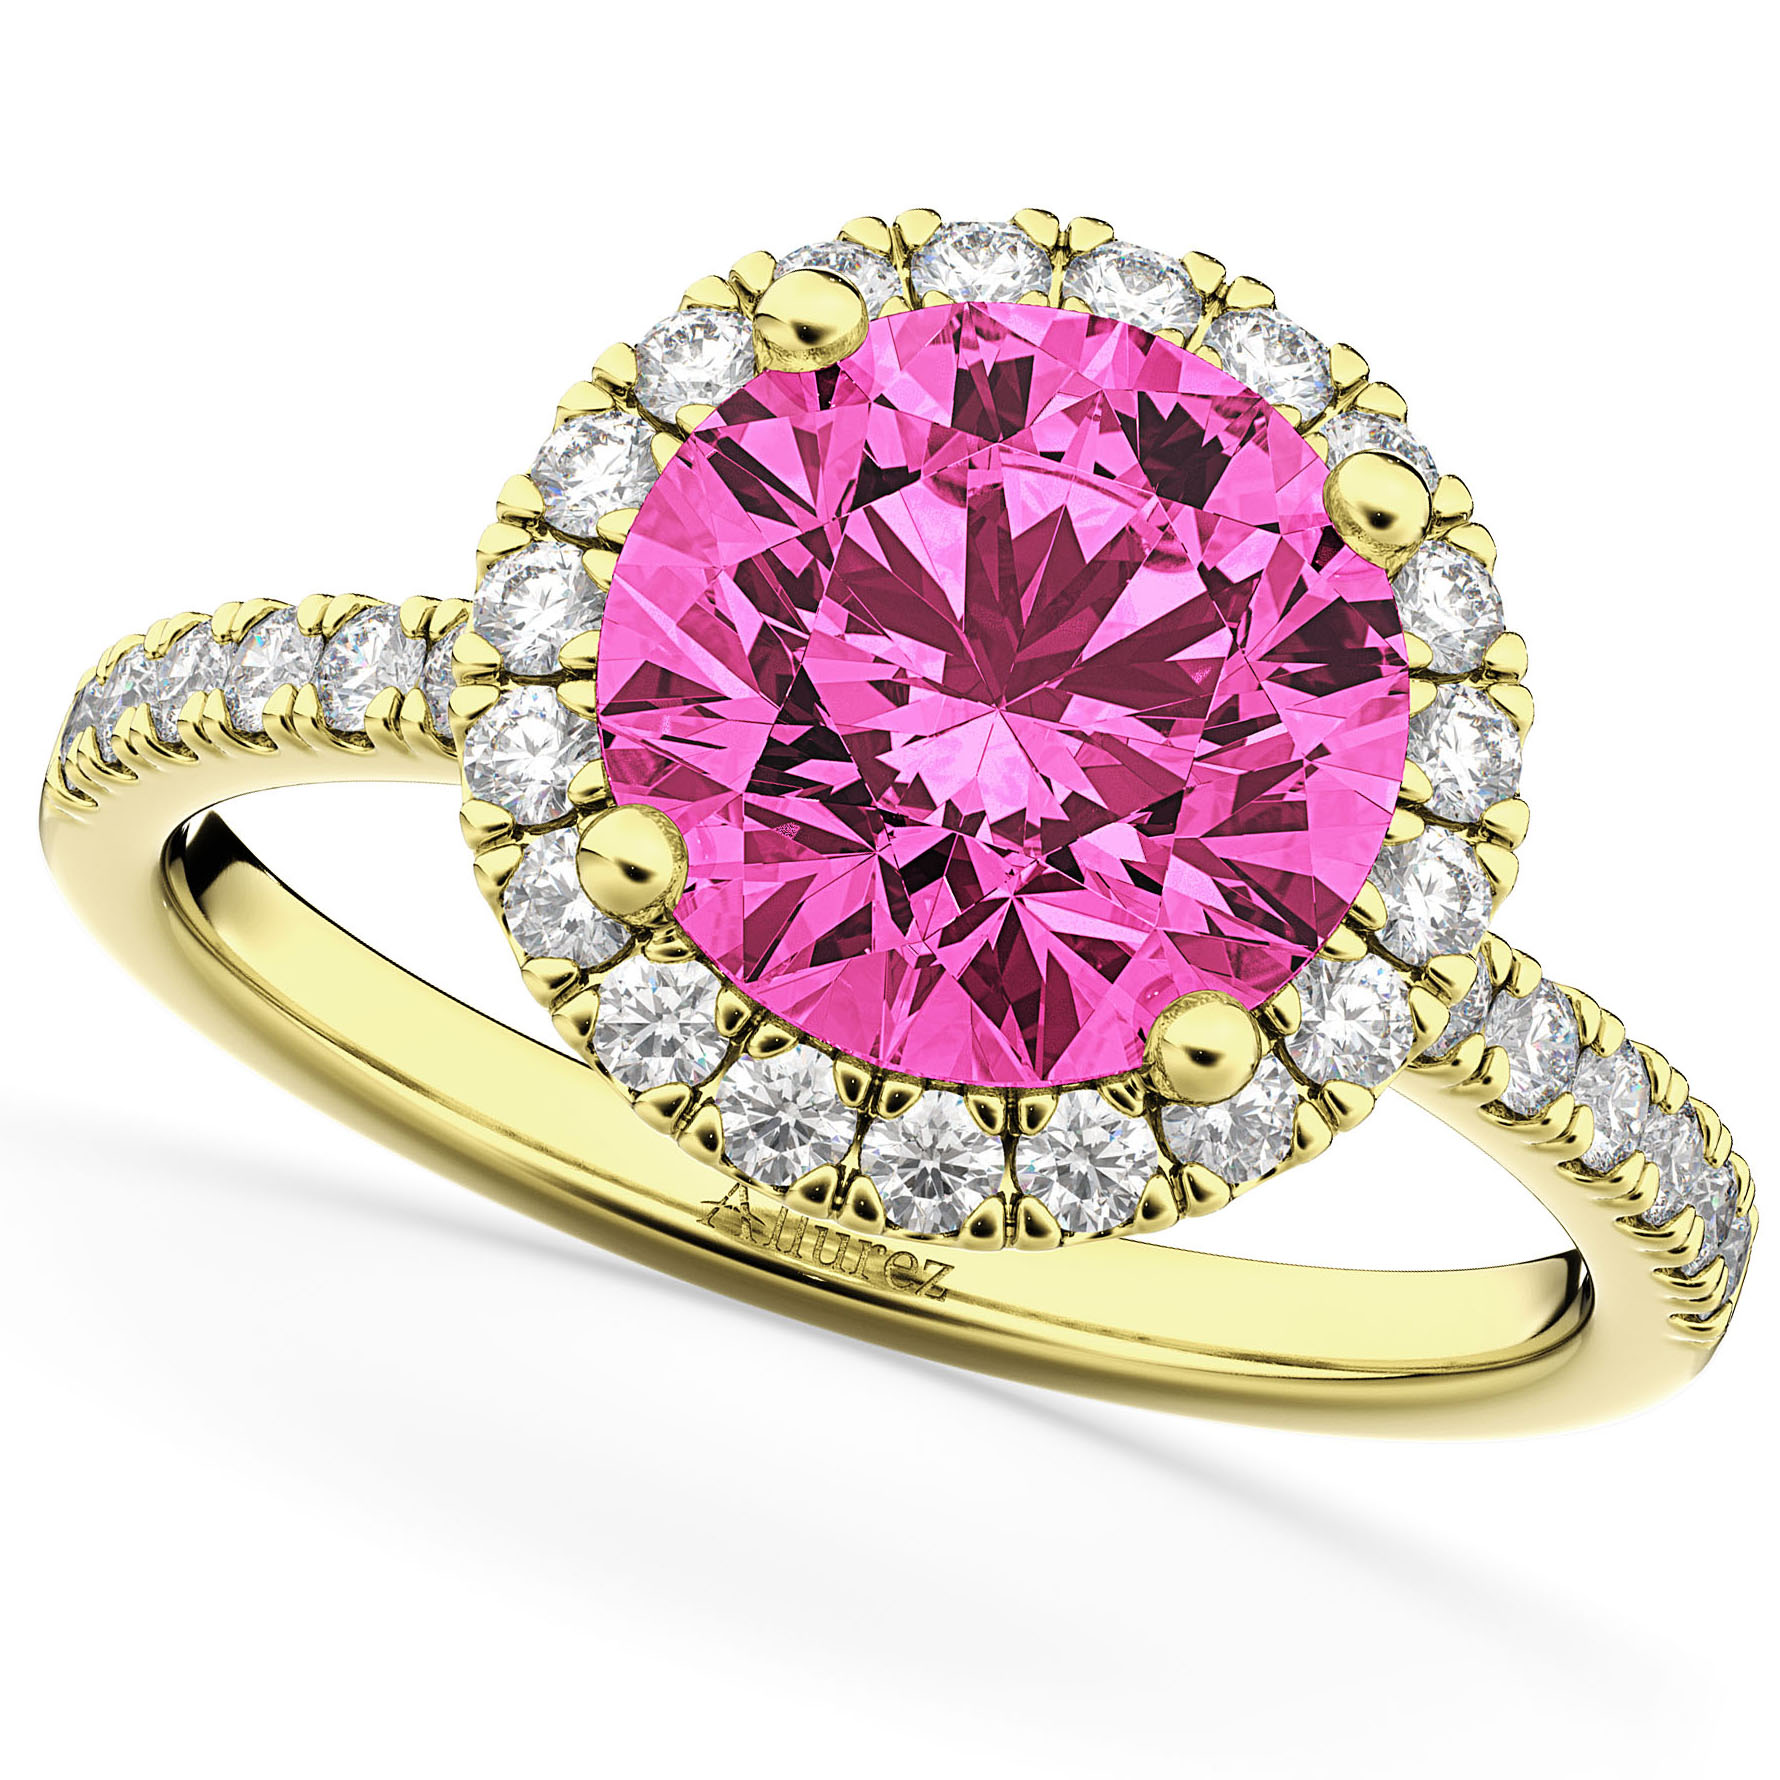 Halo Pink Tourmaline & Diamond Engagement Ring 14K Yellow Gold 2.50 ...